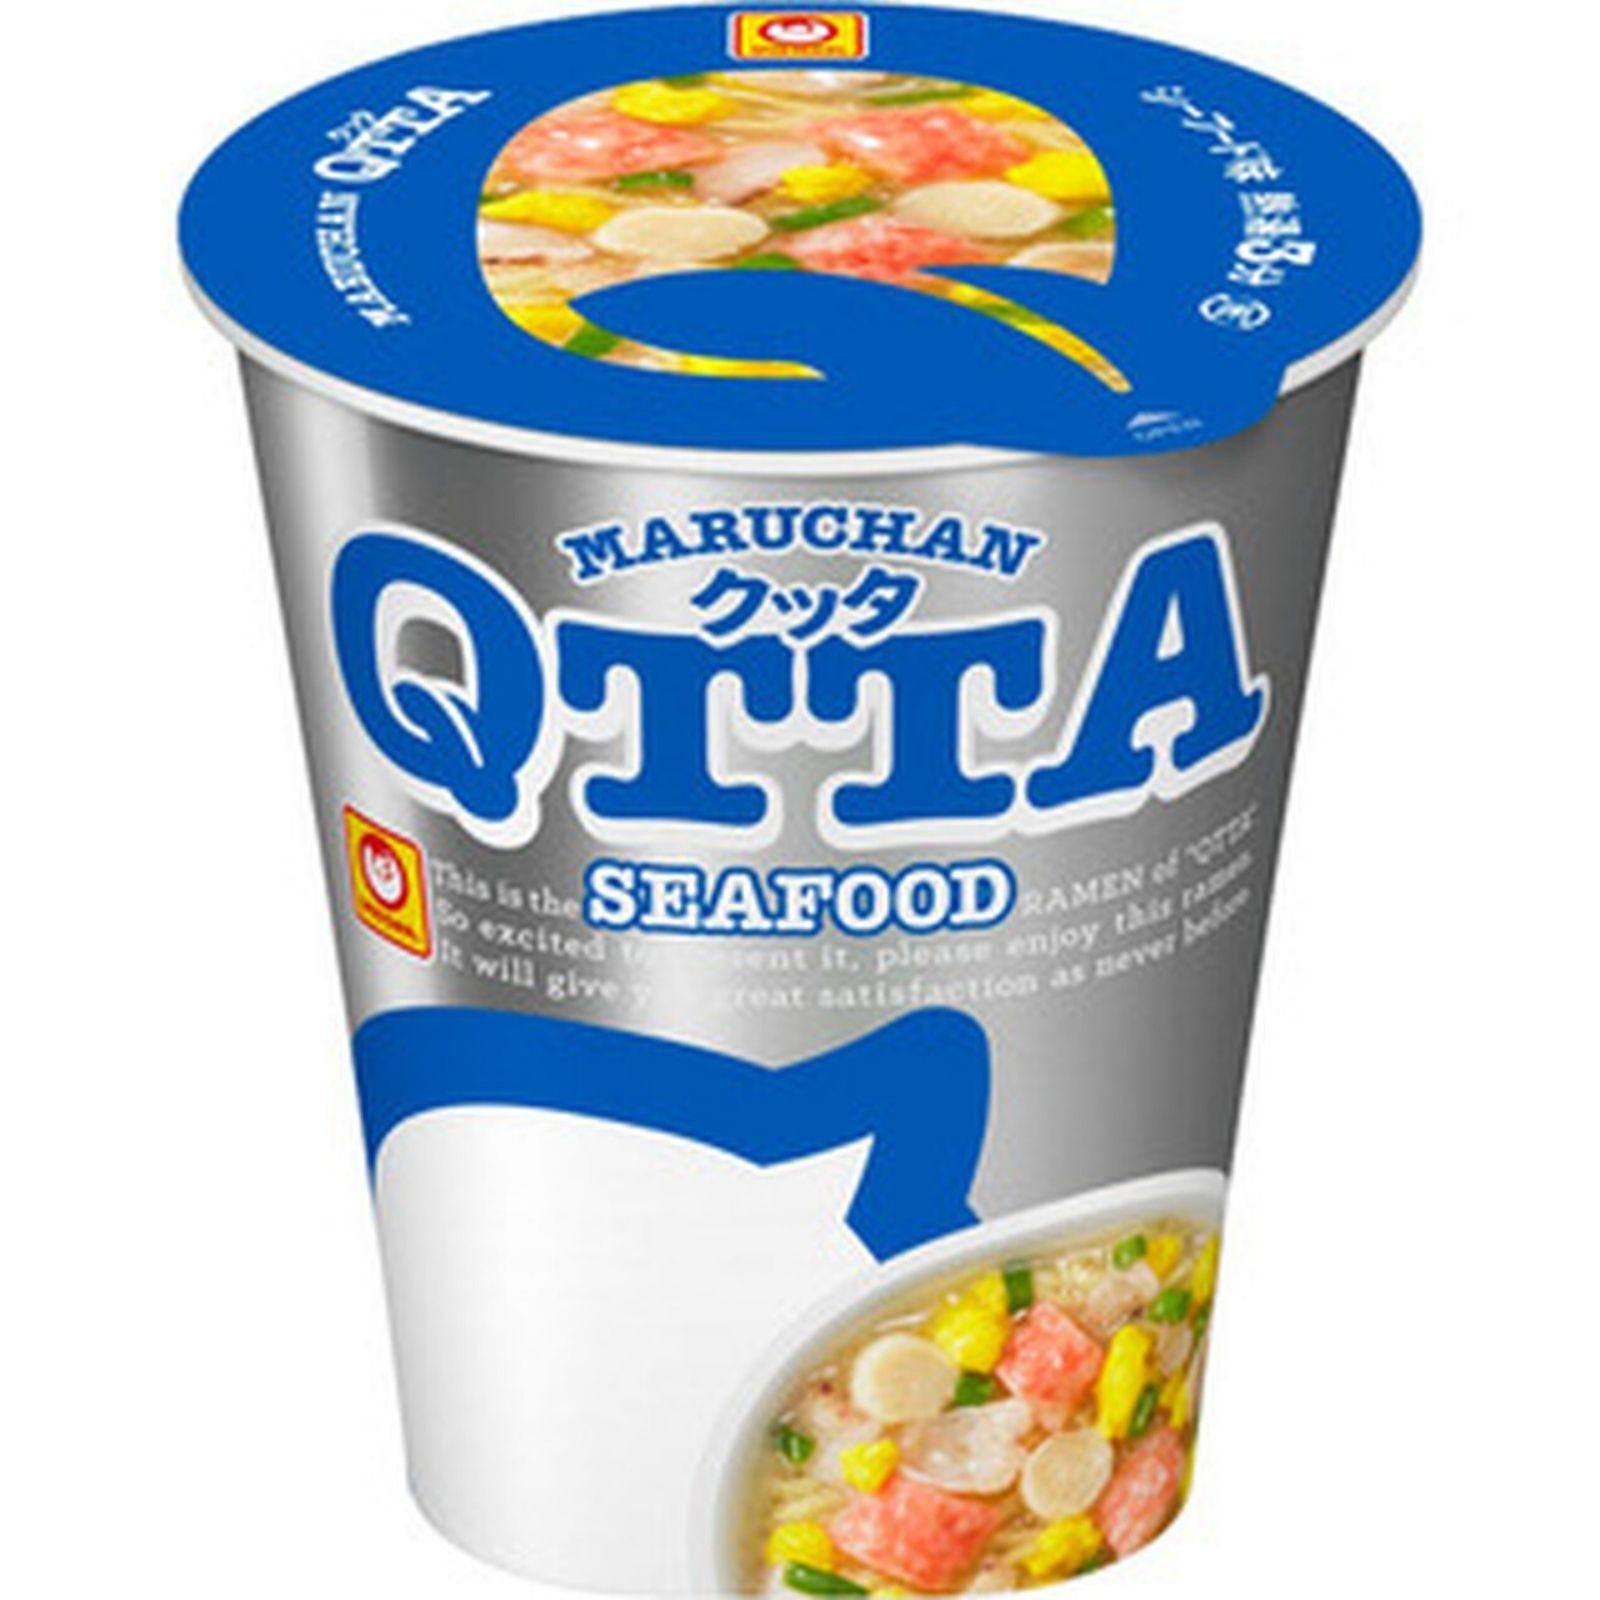 Maruchan QTTA Seafood Japan Cup Ramen Noodle 78g